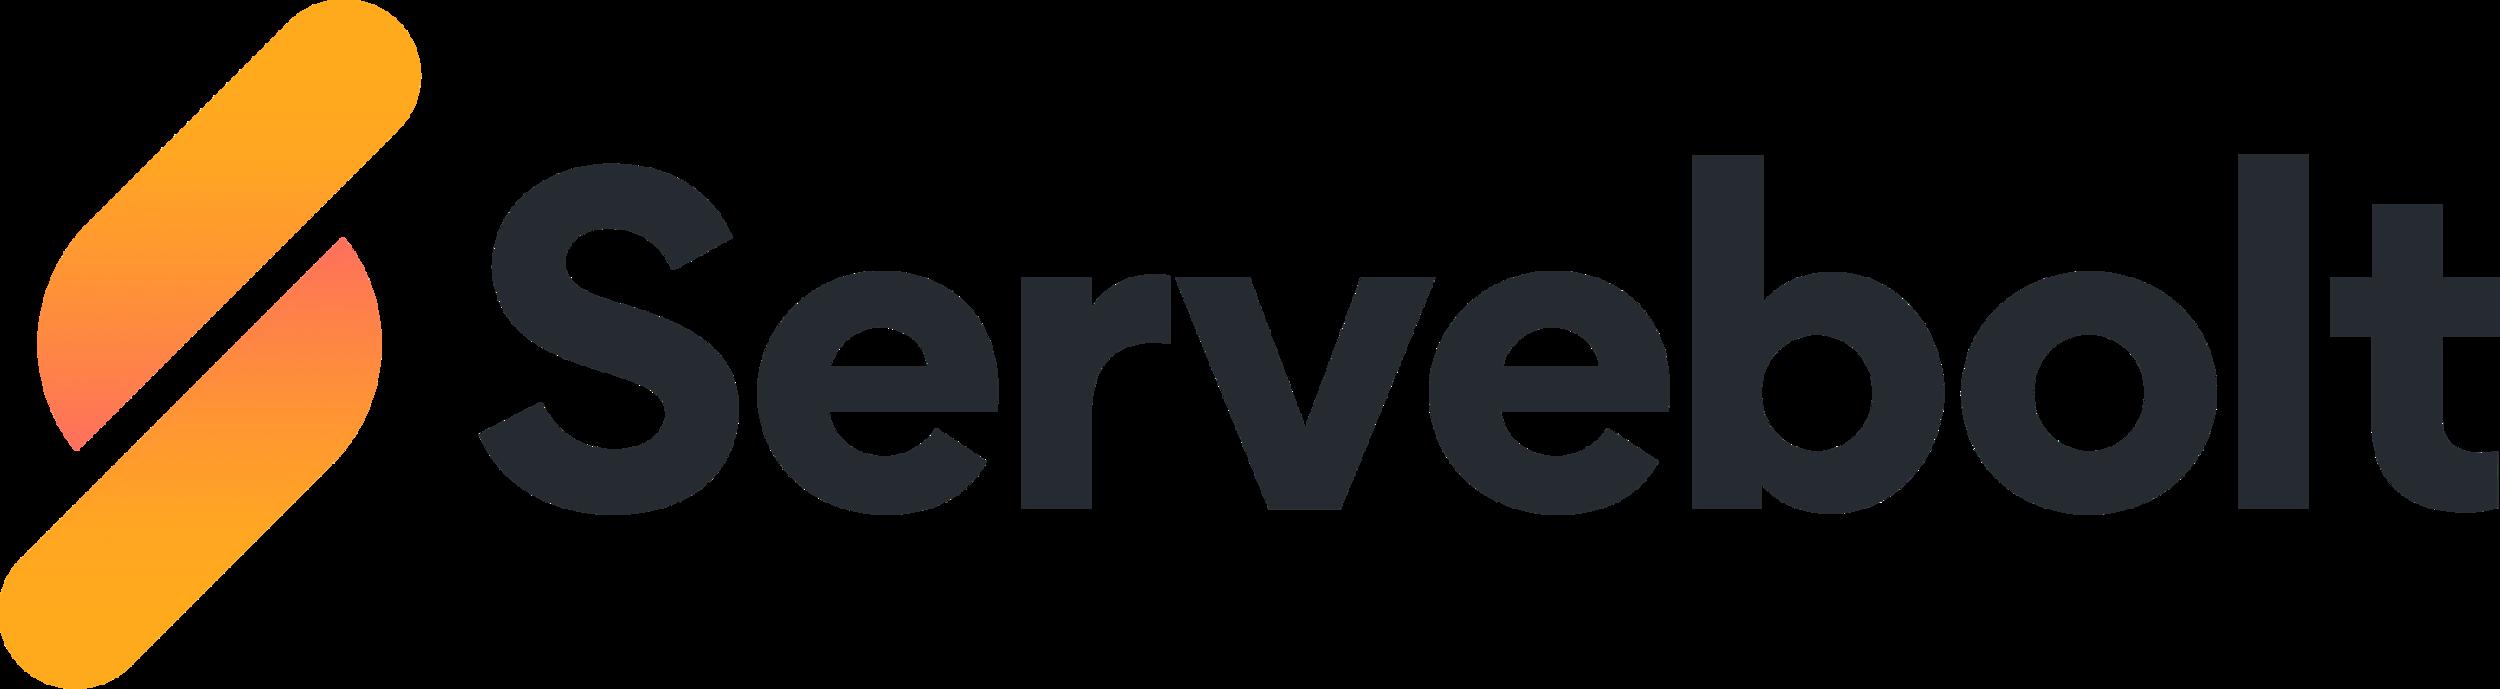 01 Servebolt_Logo_main.png